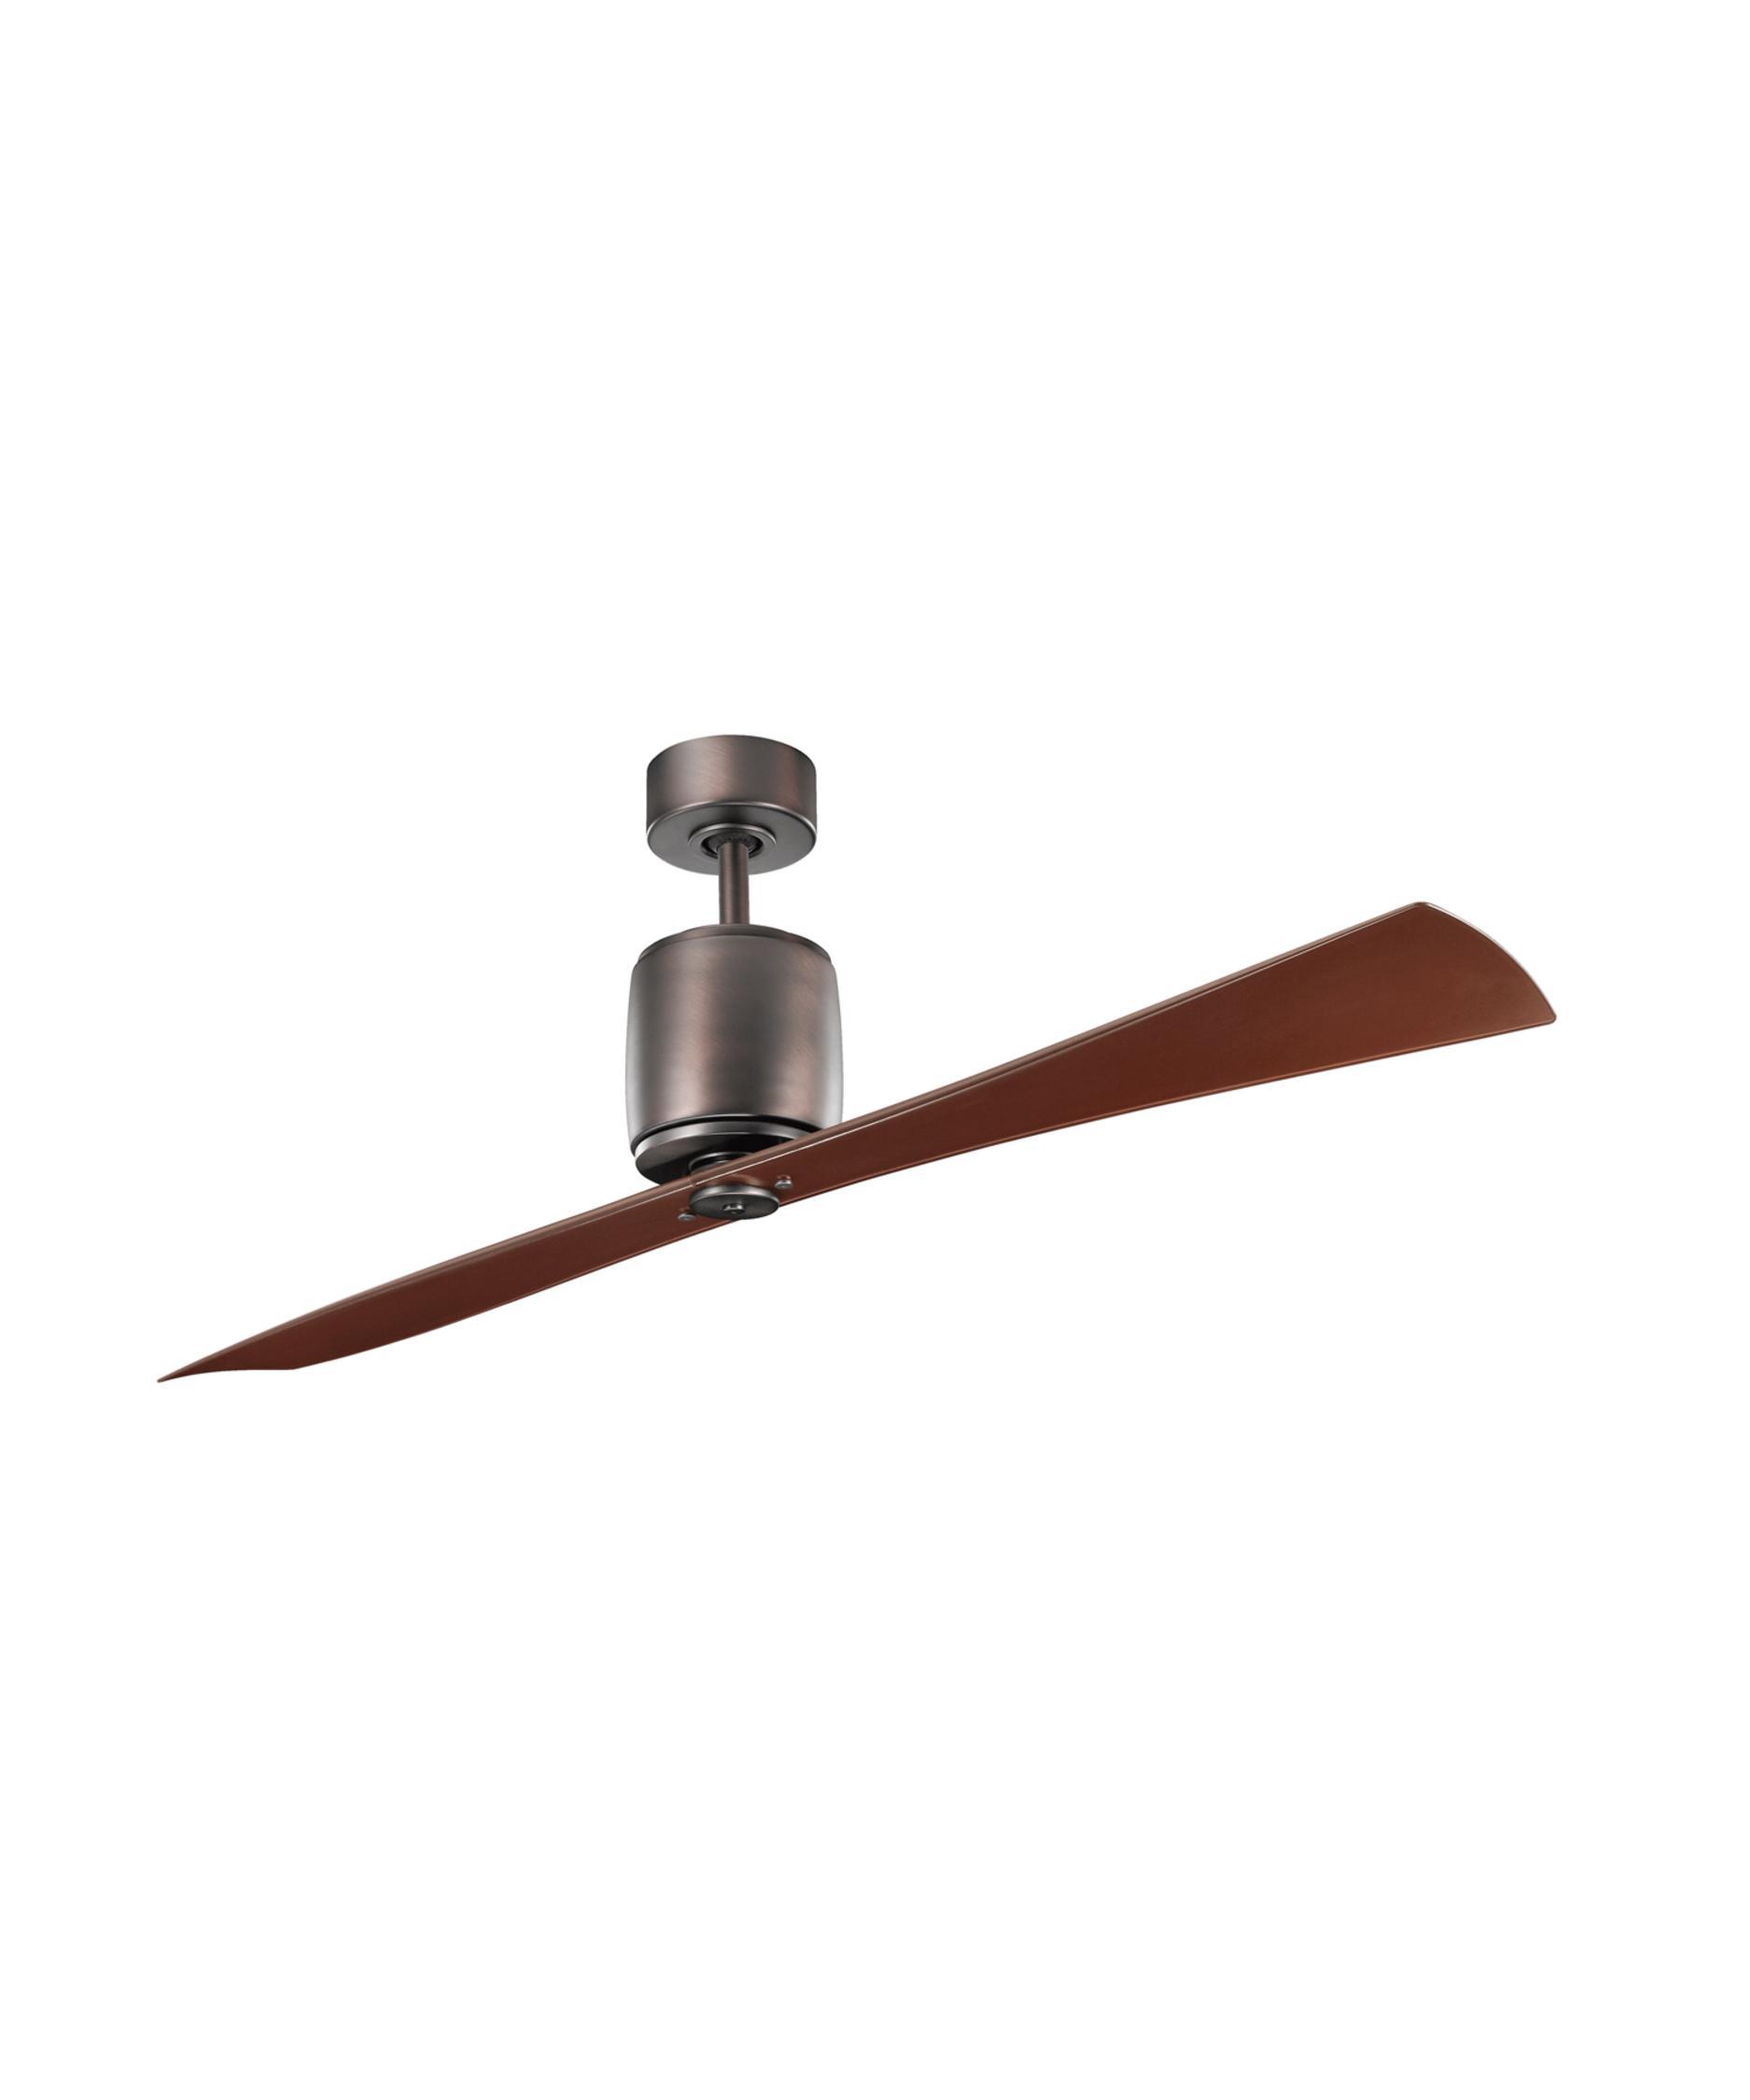 kichler  ferron  inch  blade ceiling fan  capitol  - shown in oil brushed bronze finish